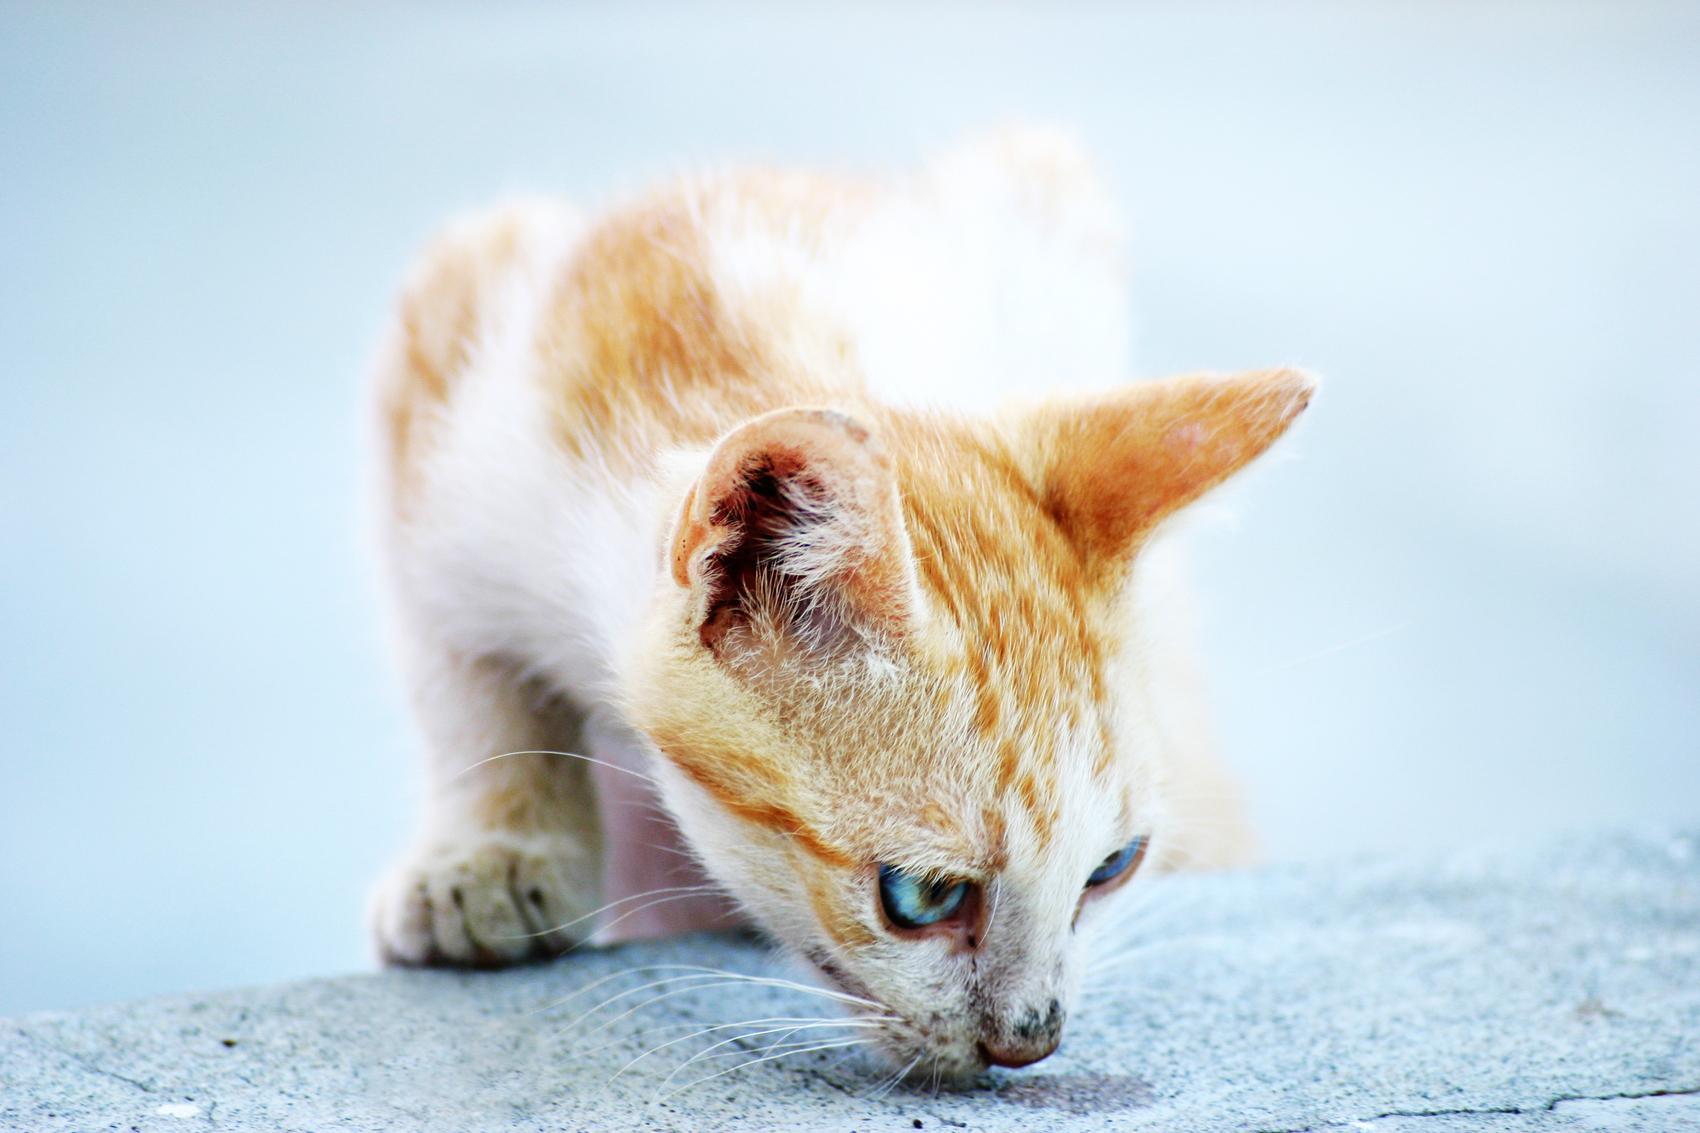 White and orange cat, Animal, Cat, Claws, Closeup, HQ Photo